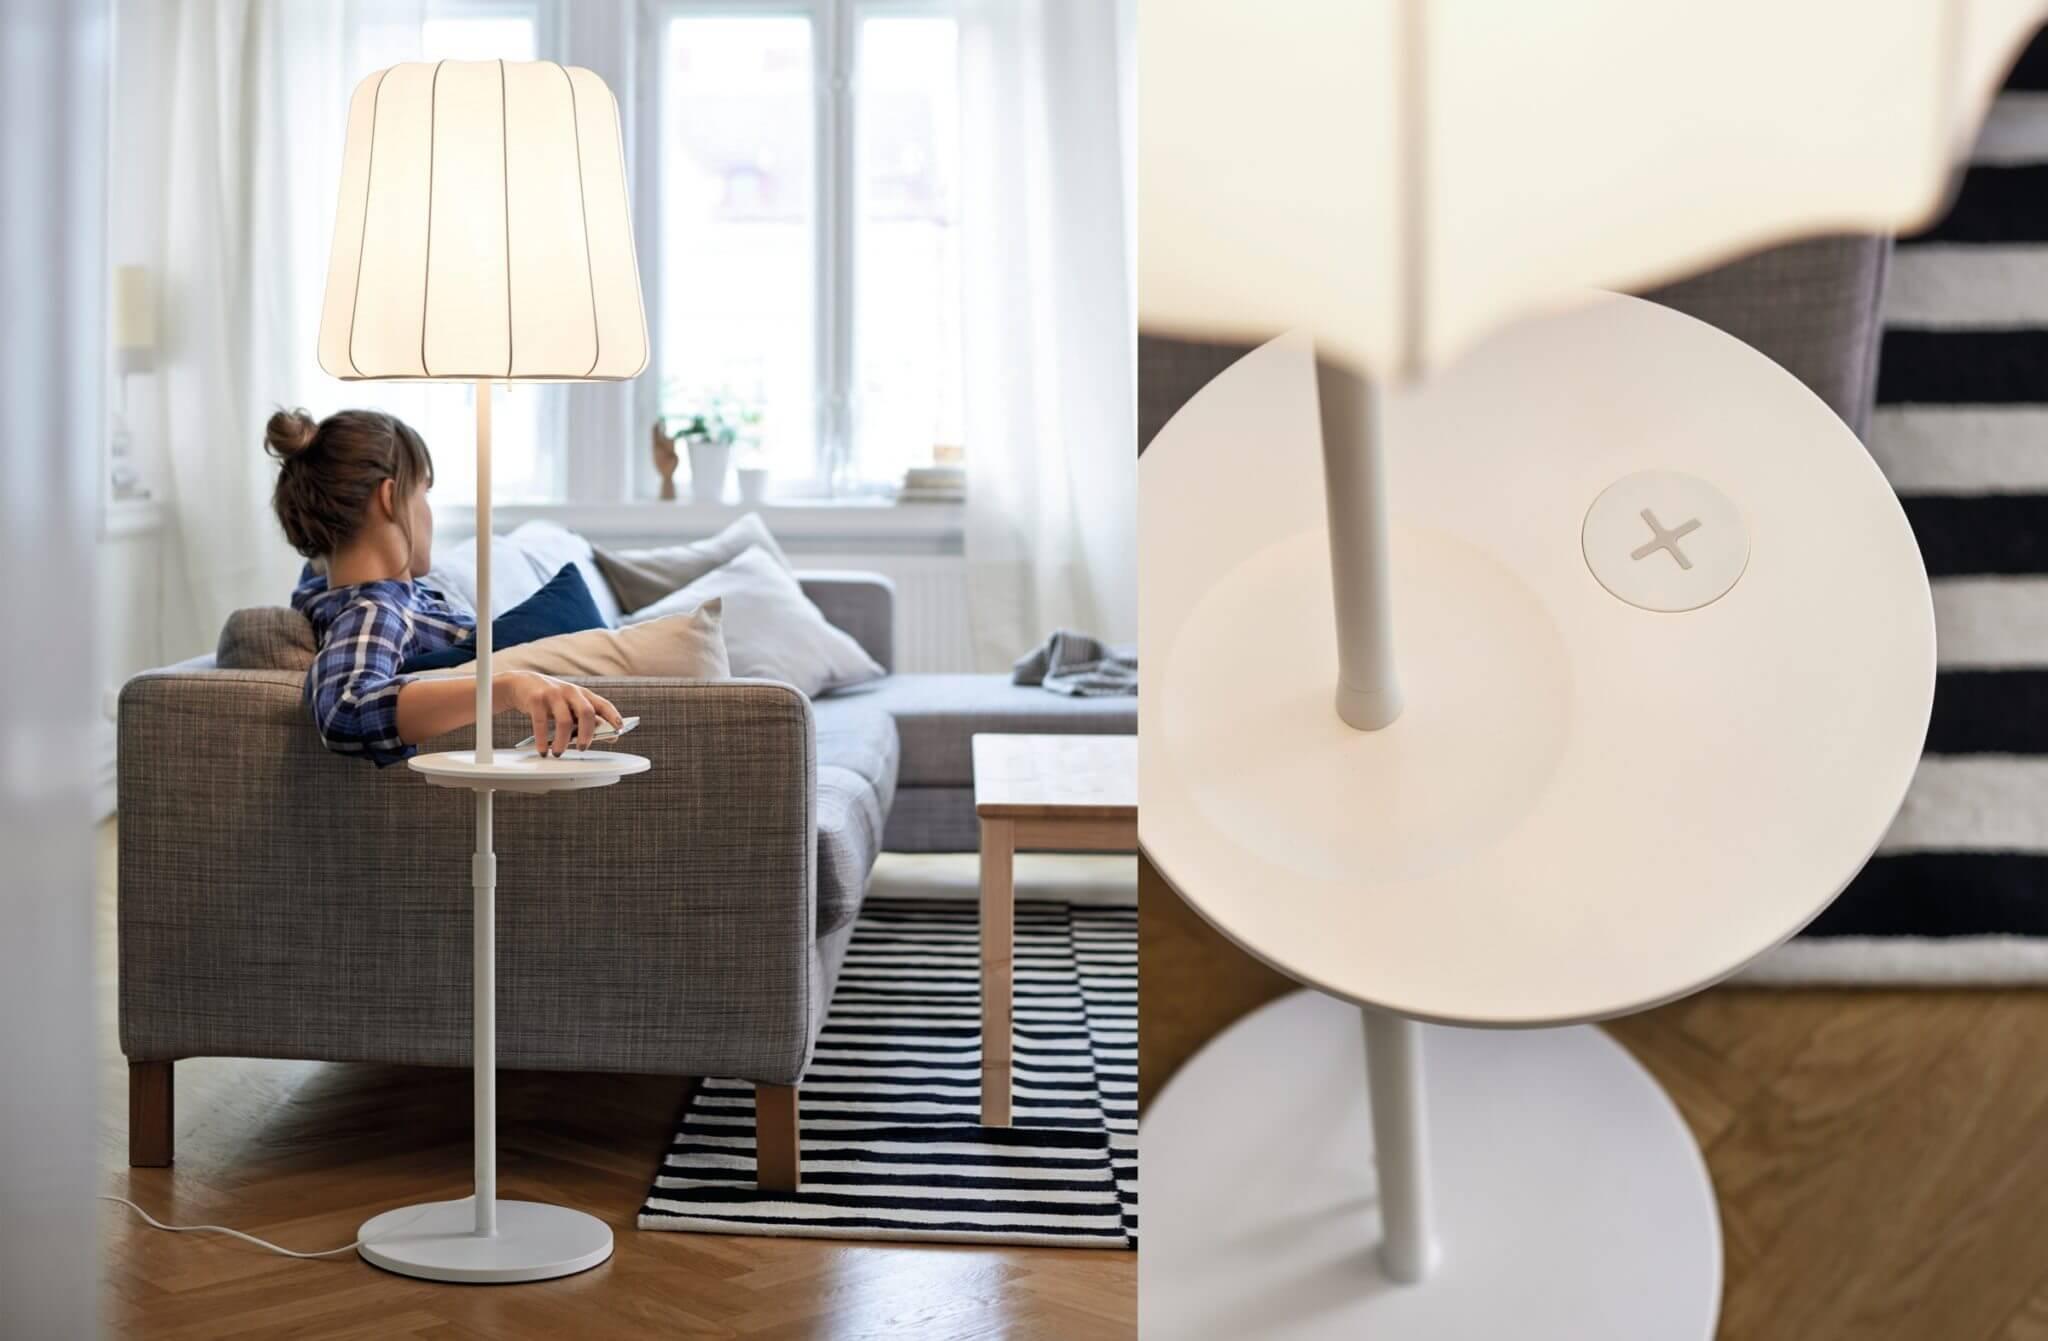 Ikea Lampen Und Tische Mit Qi Ladegerat Ab April